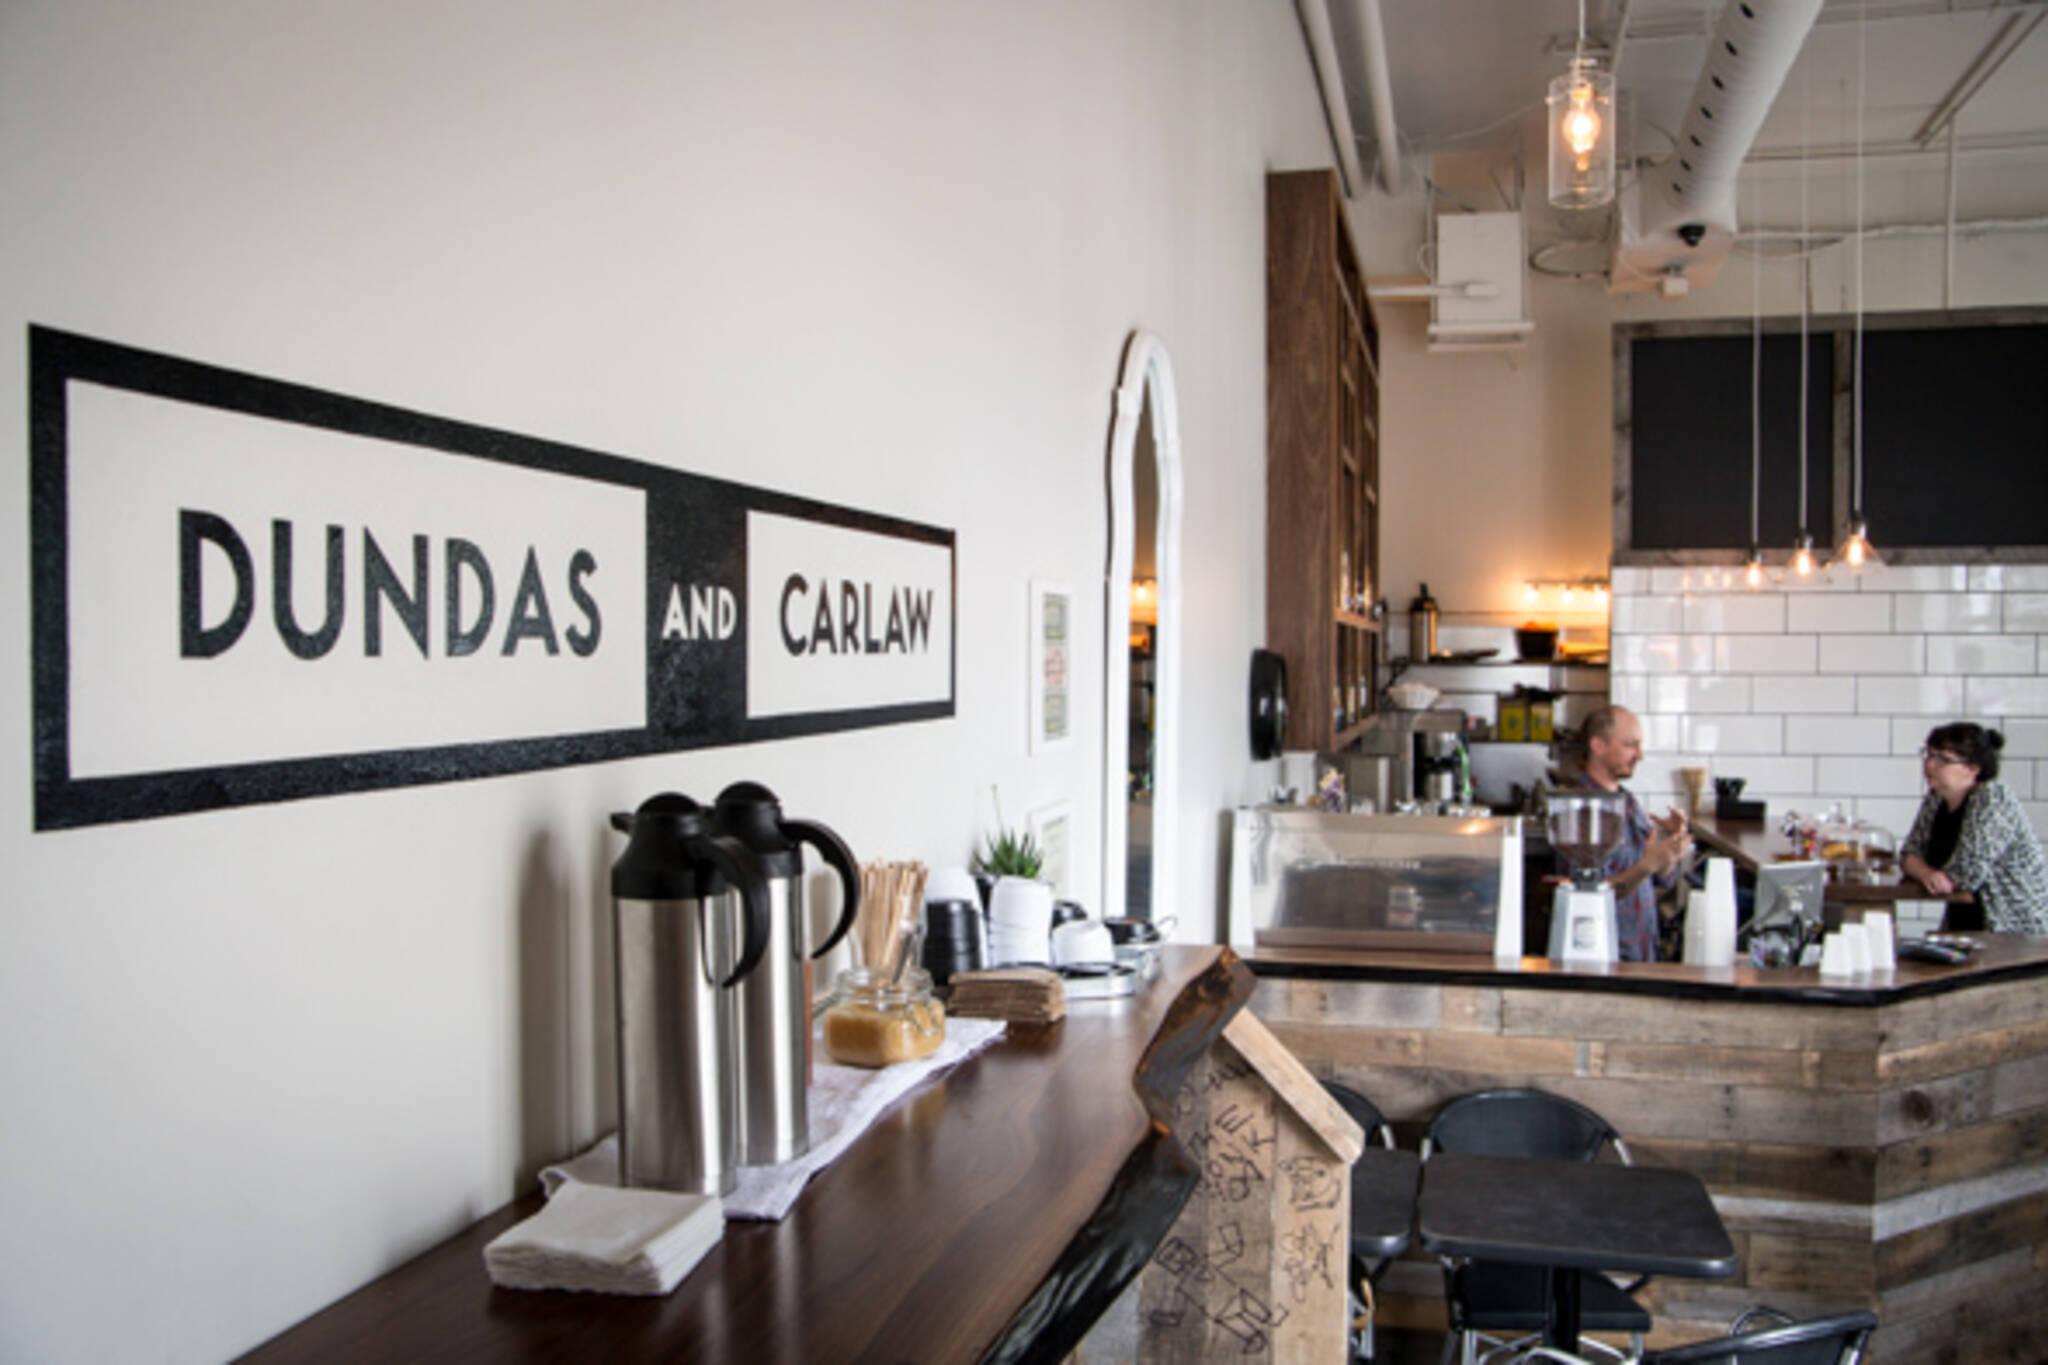 Dundas and Carlaw cafe Toronto